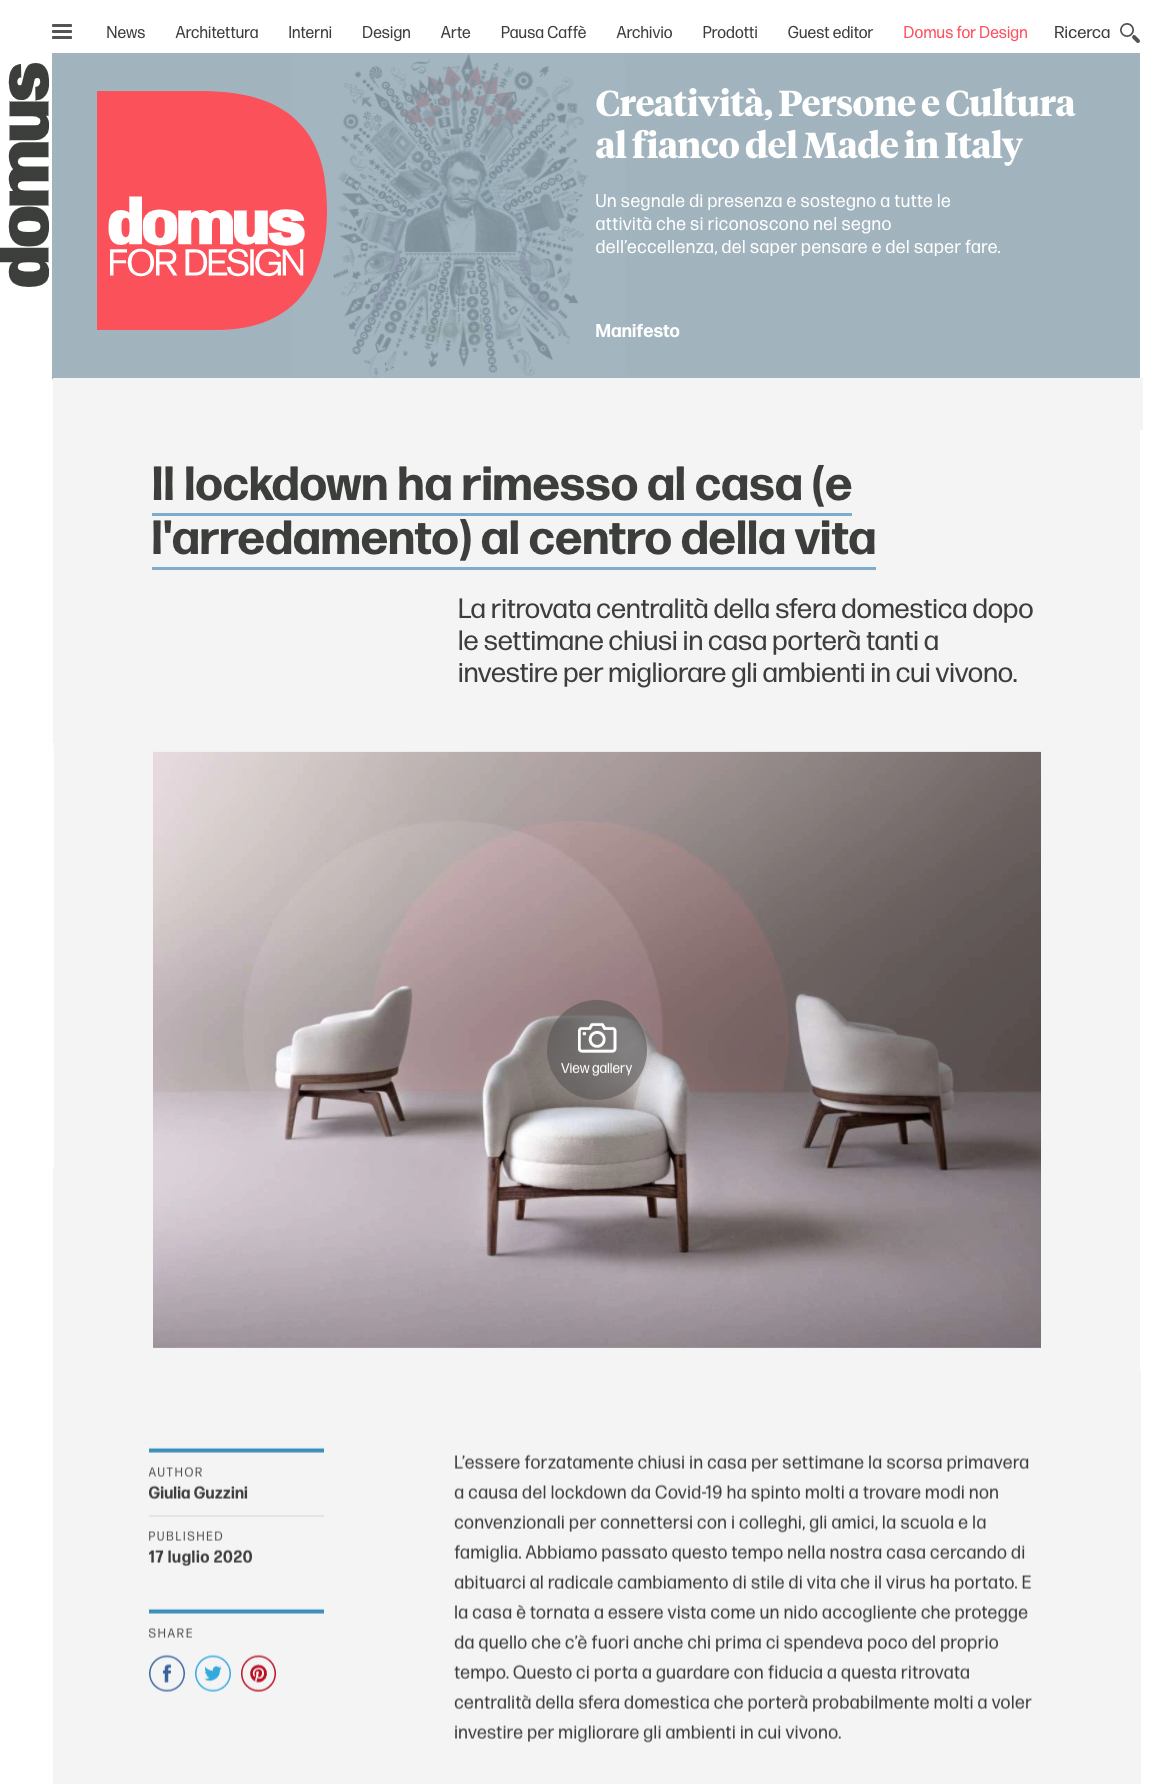 Domus web features Macaron lounge